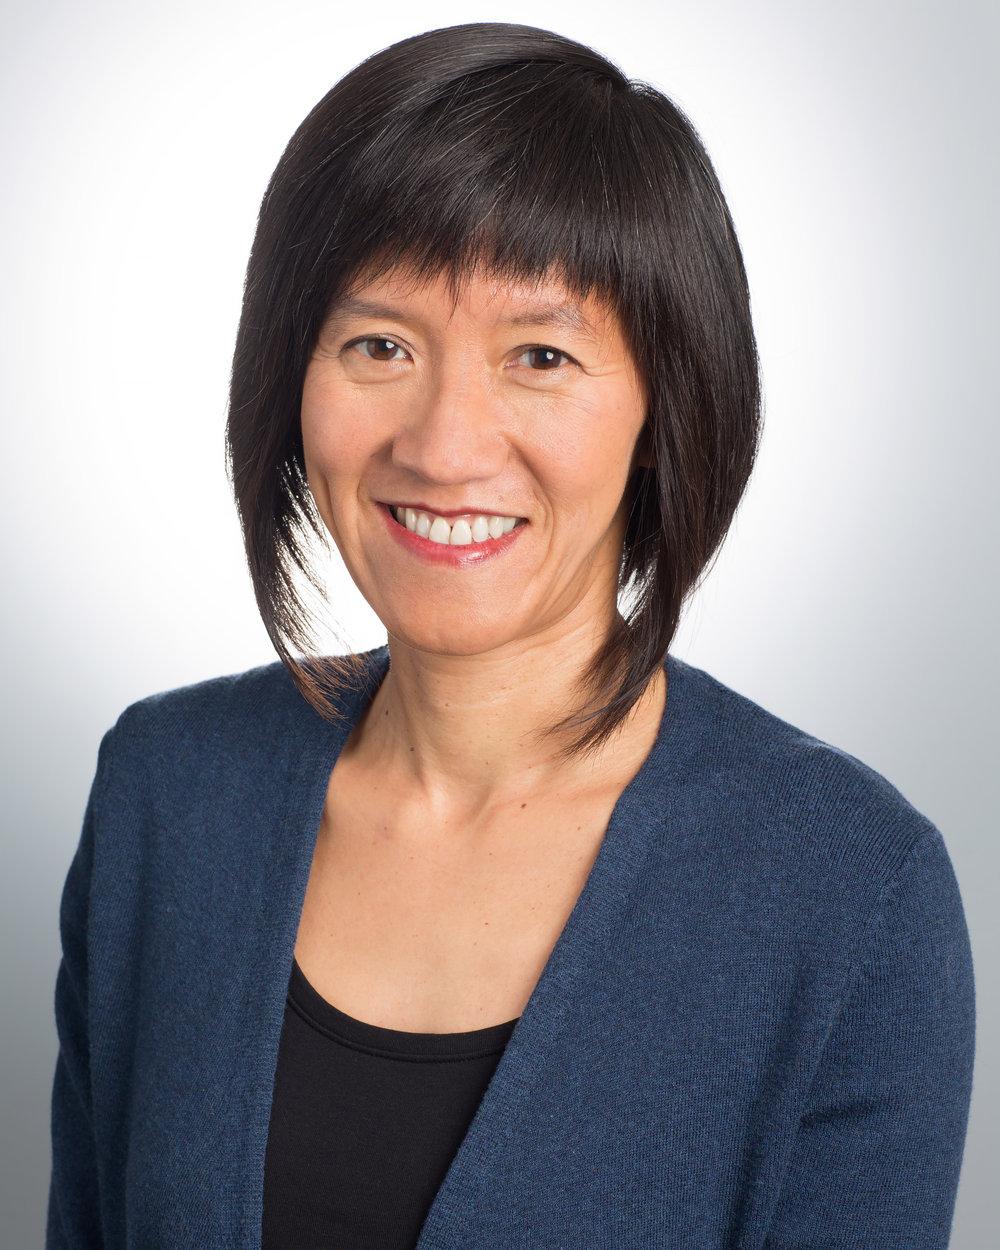 Edith Chen